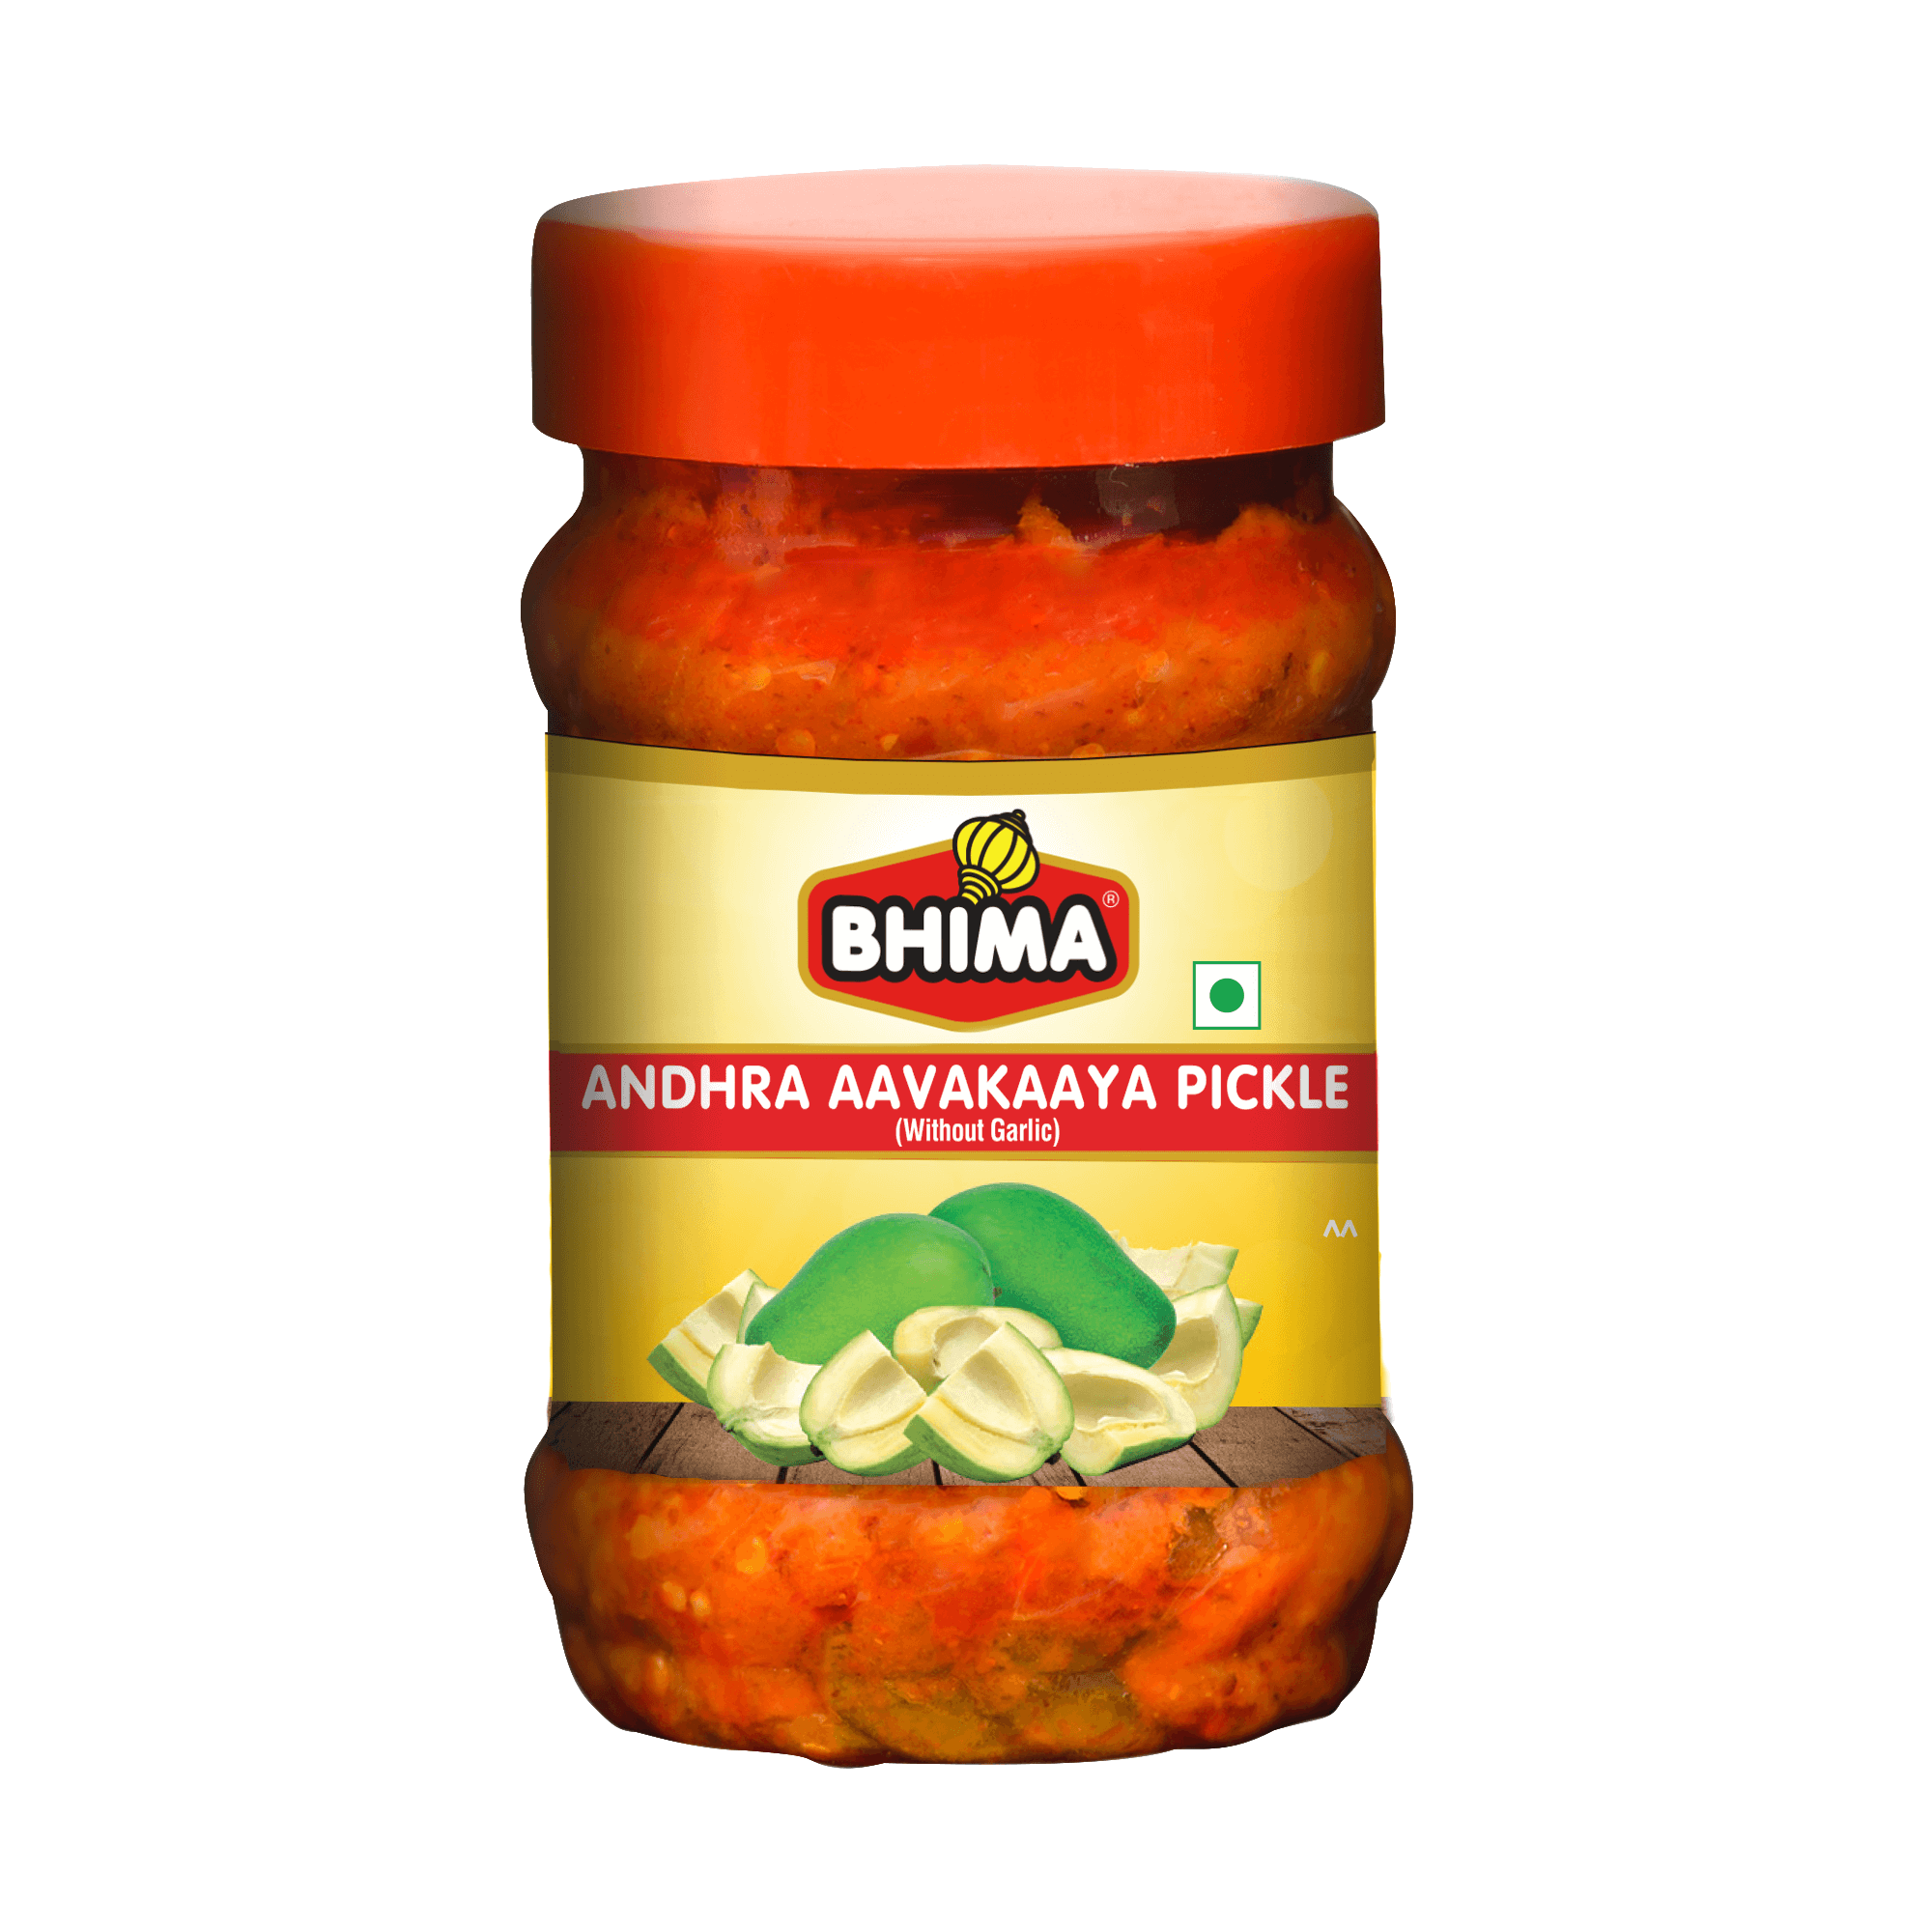 Bhima – Andhra Avakaaya